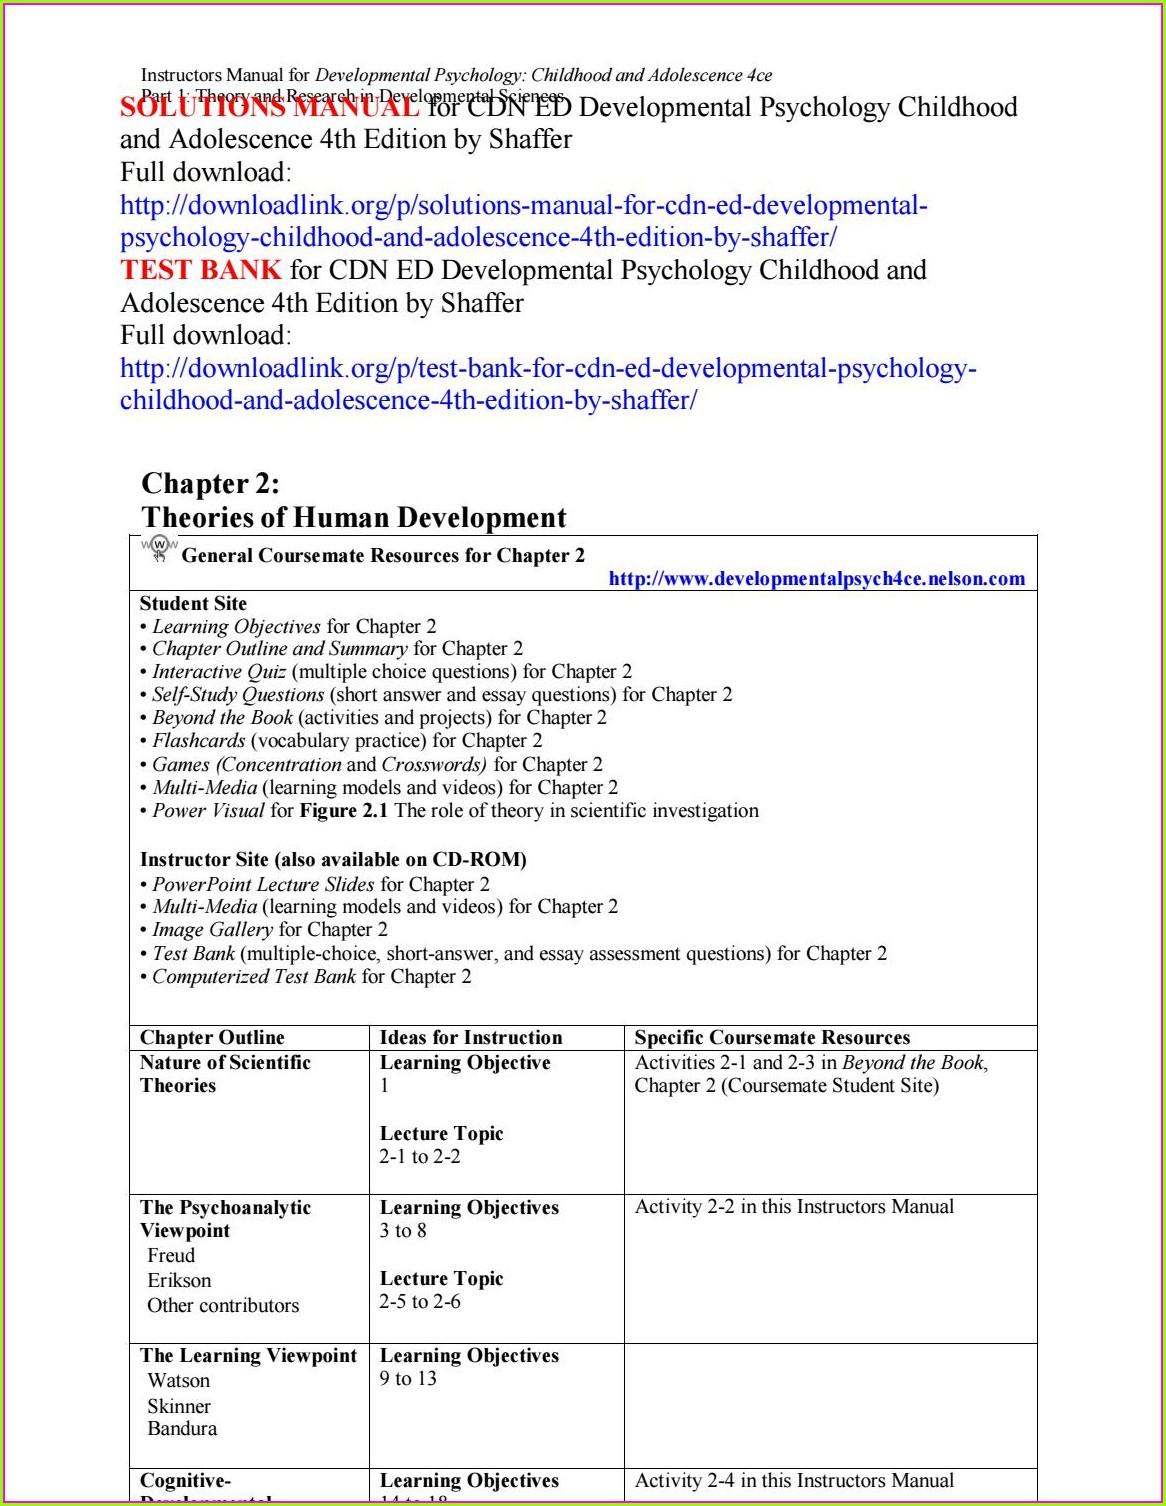 Child Development Theorists Video Worksheet Answers